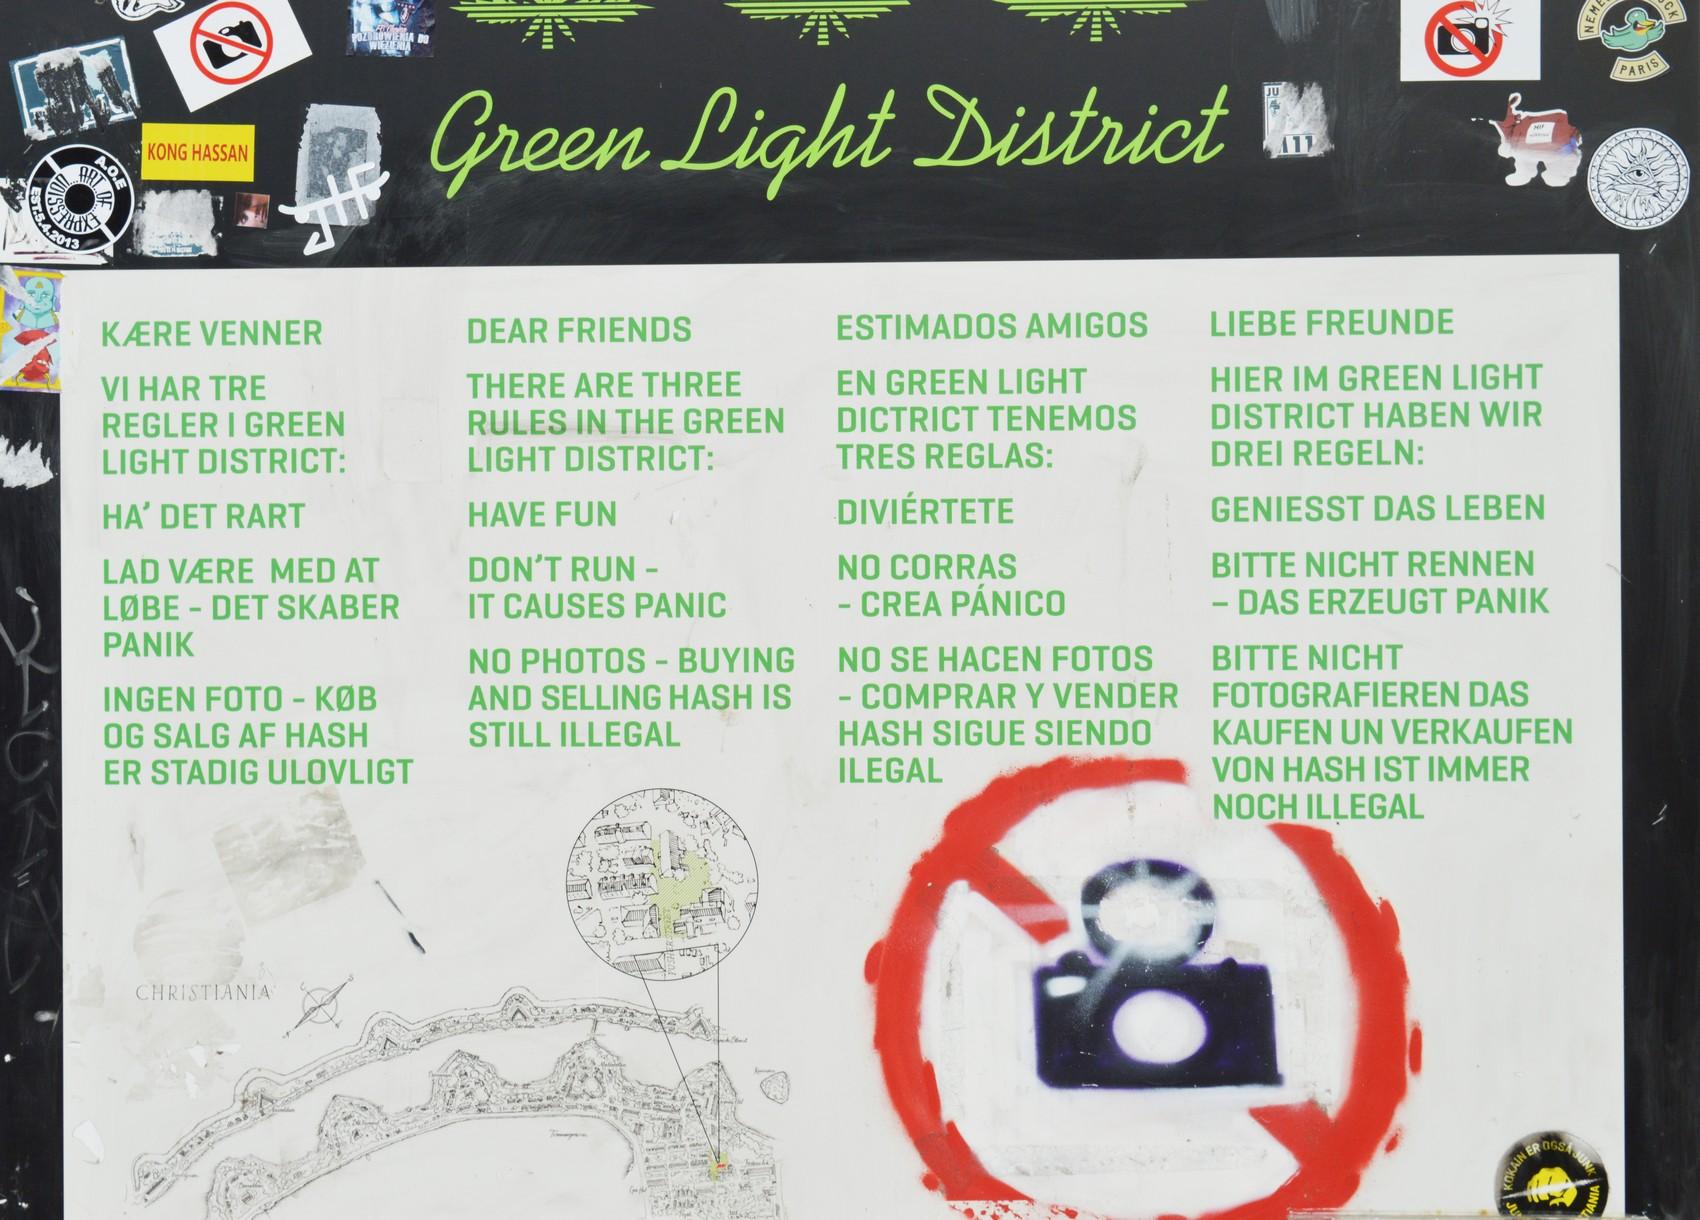 greenlightdistrict